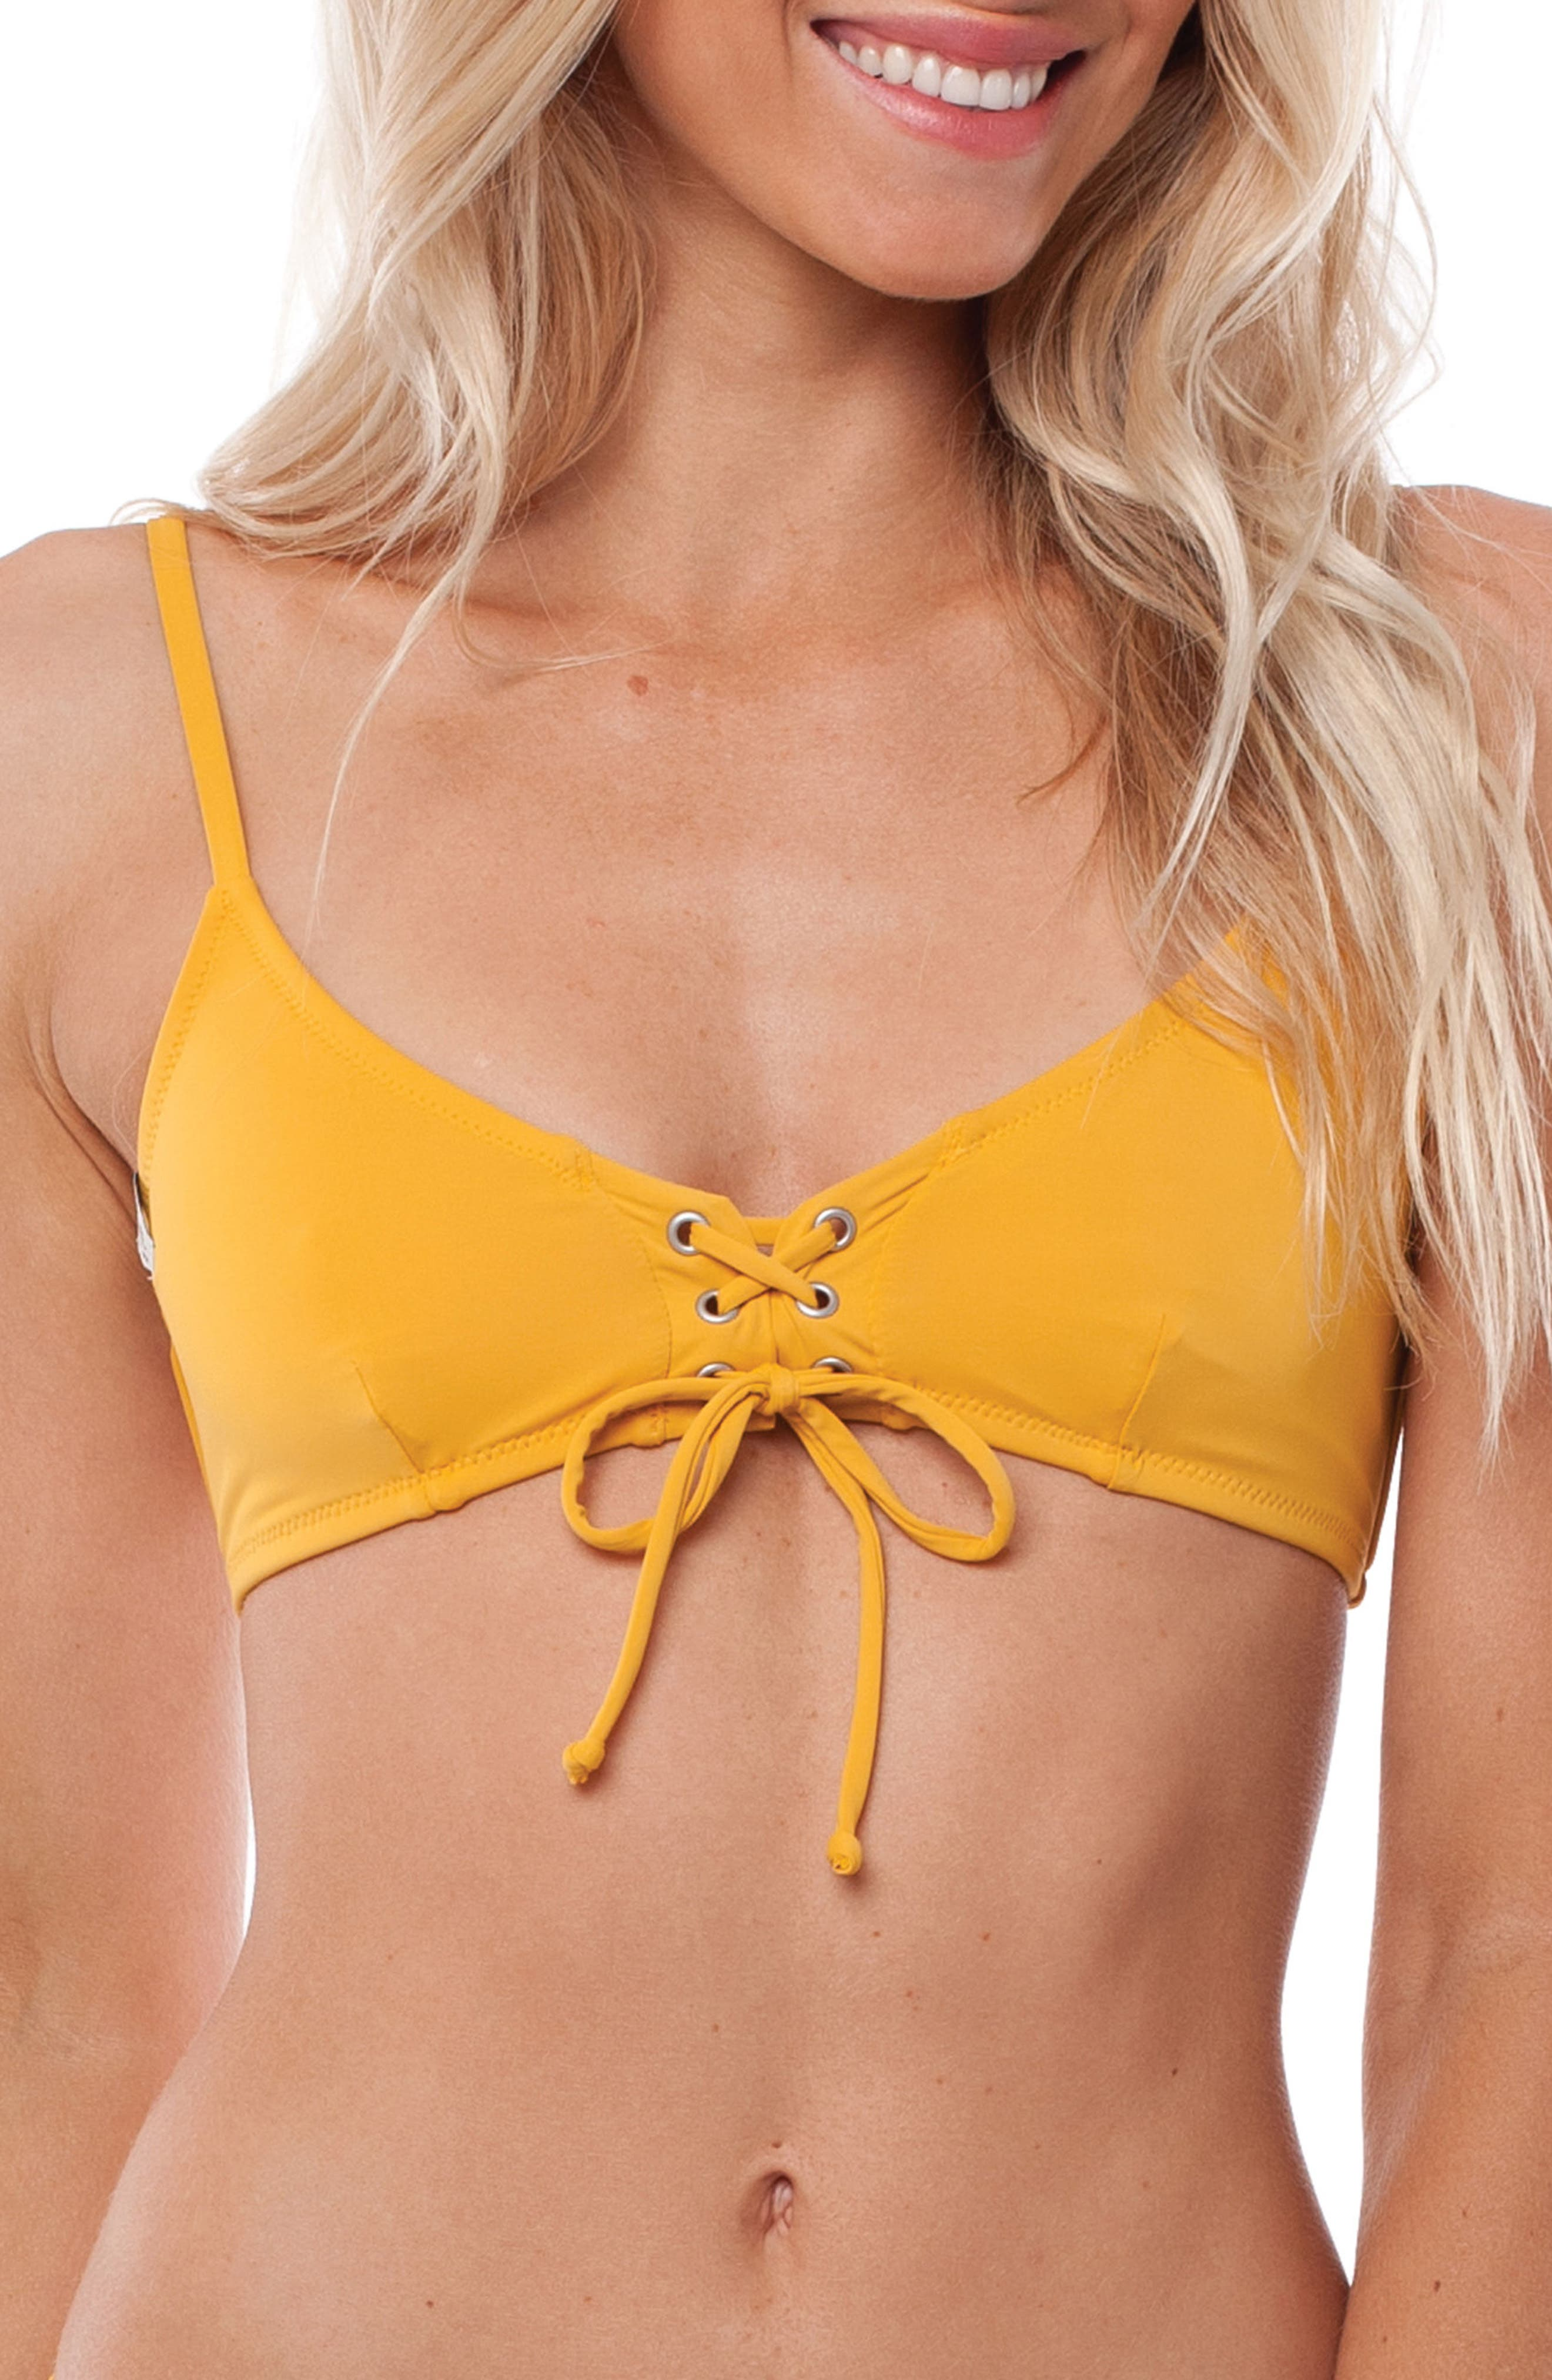 Sunchaser Bikini Top,                             Main thumbnail 1, color,                             Marigold